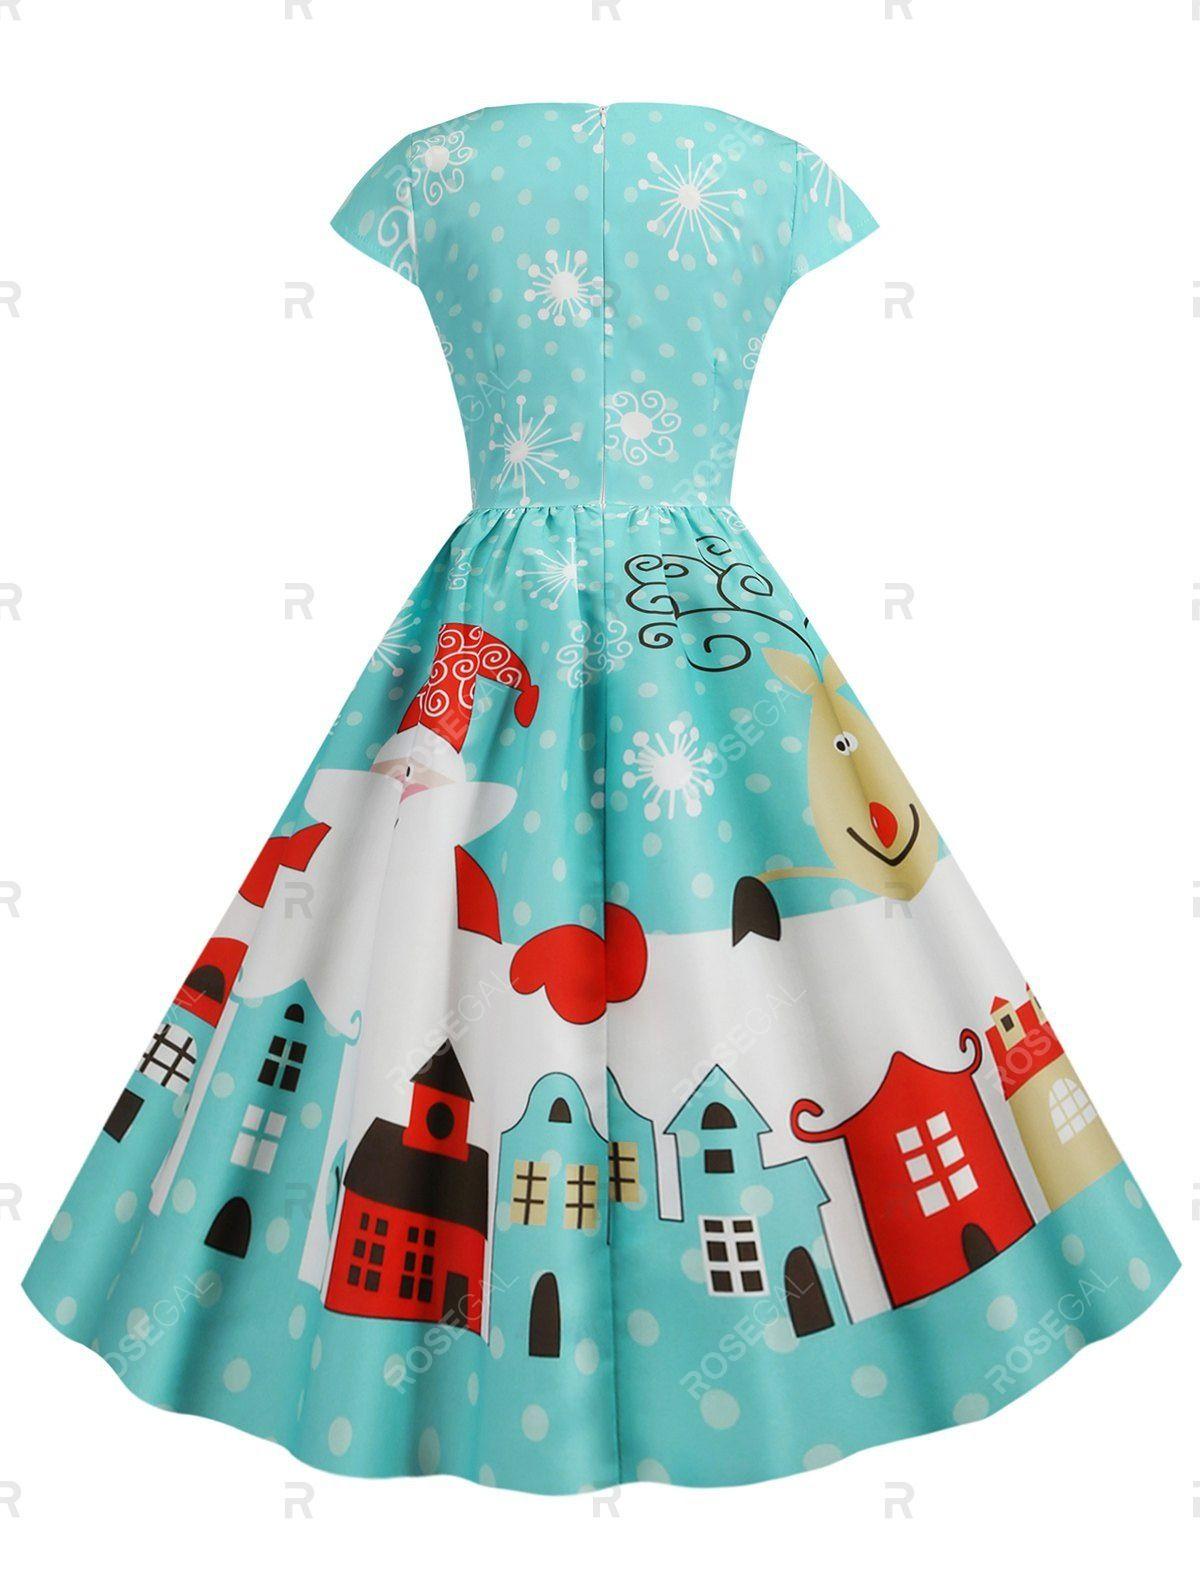 Christmas Castle Santa Claus Tree Print Surplice Midi Dress Vintage Party Dresses Christmas Party Dress Plus Size Vintage Dresses [ 1596 x 1200 Pixel ]